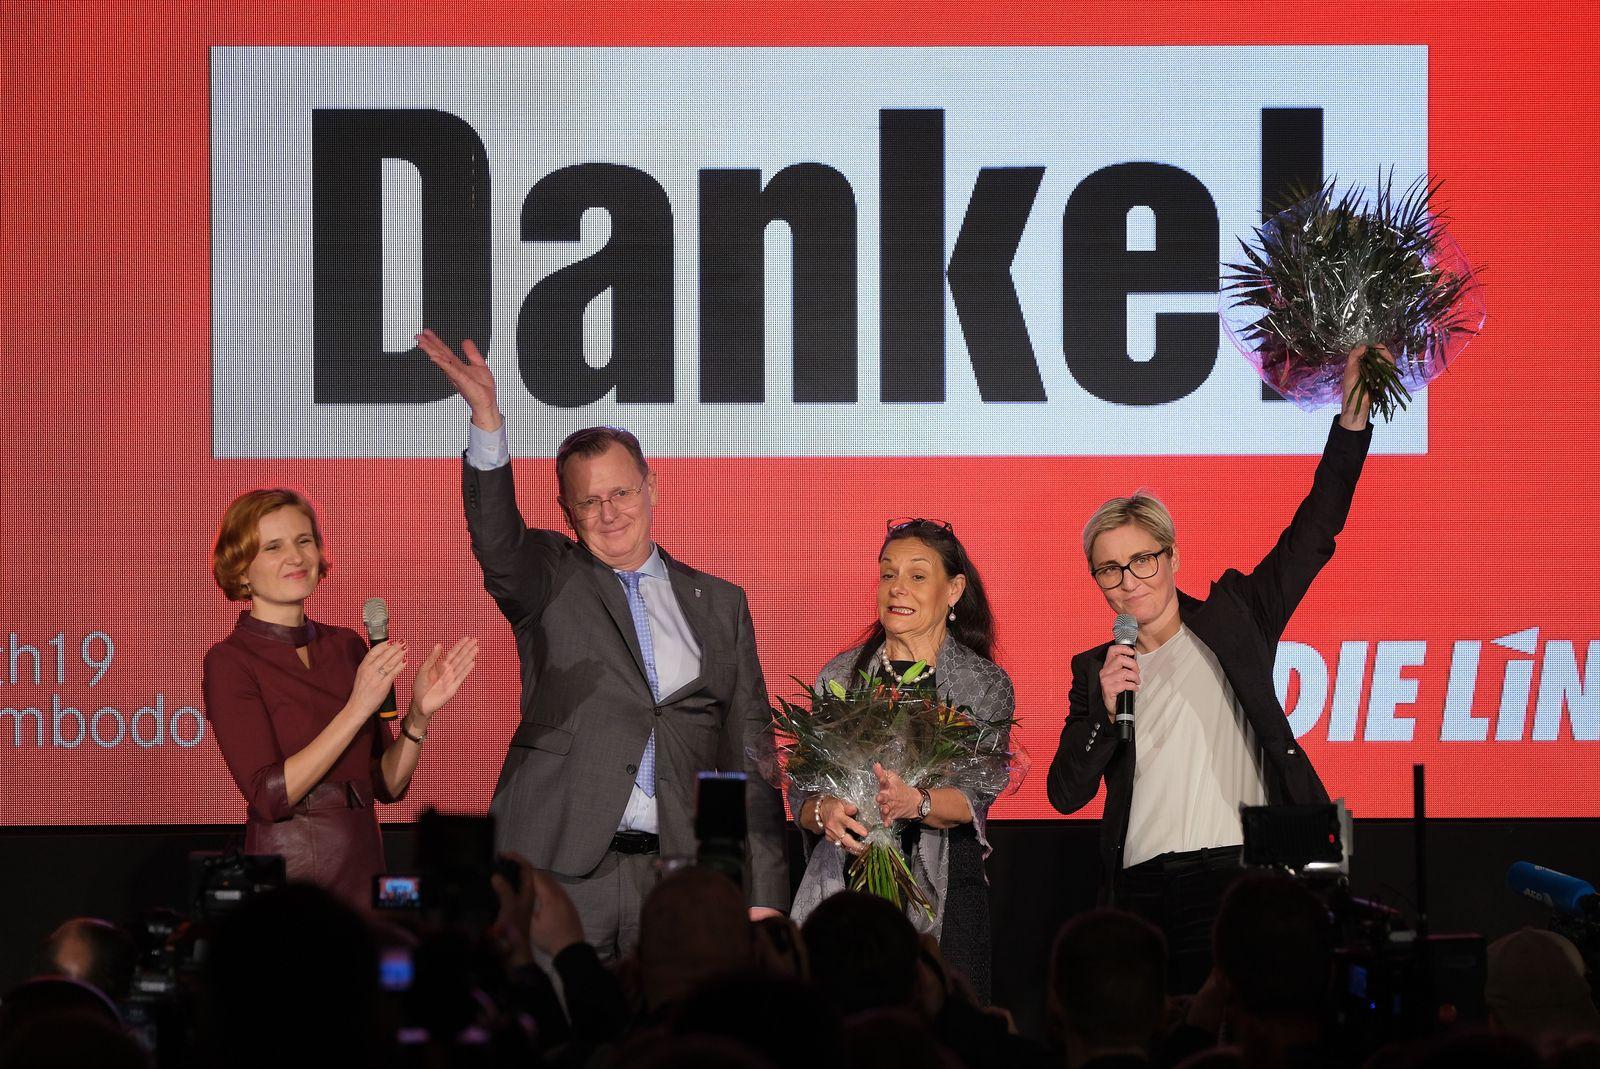 Thüringen/ Wahlnacht/ Linke